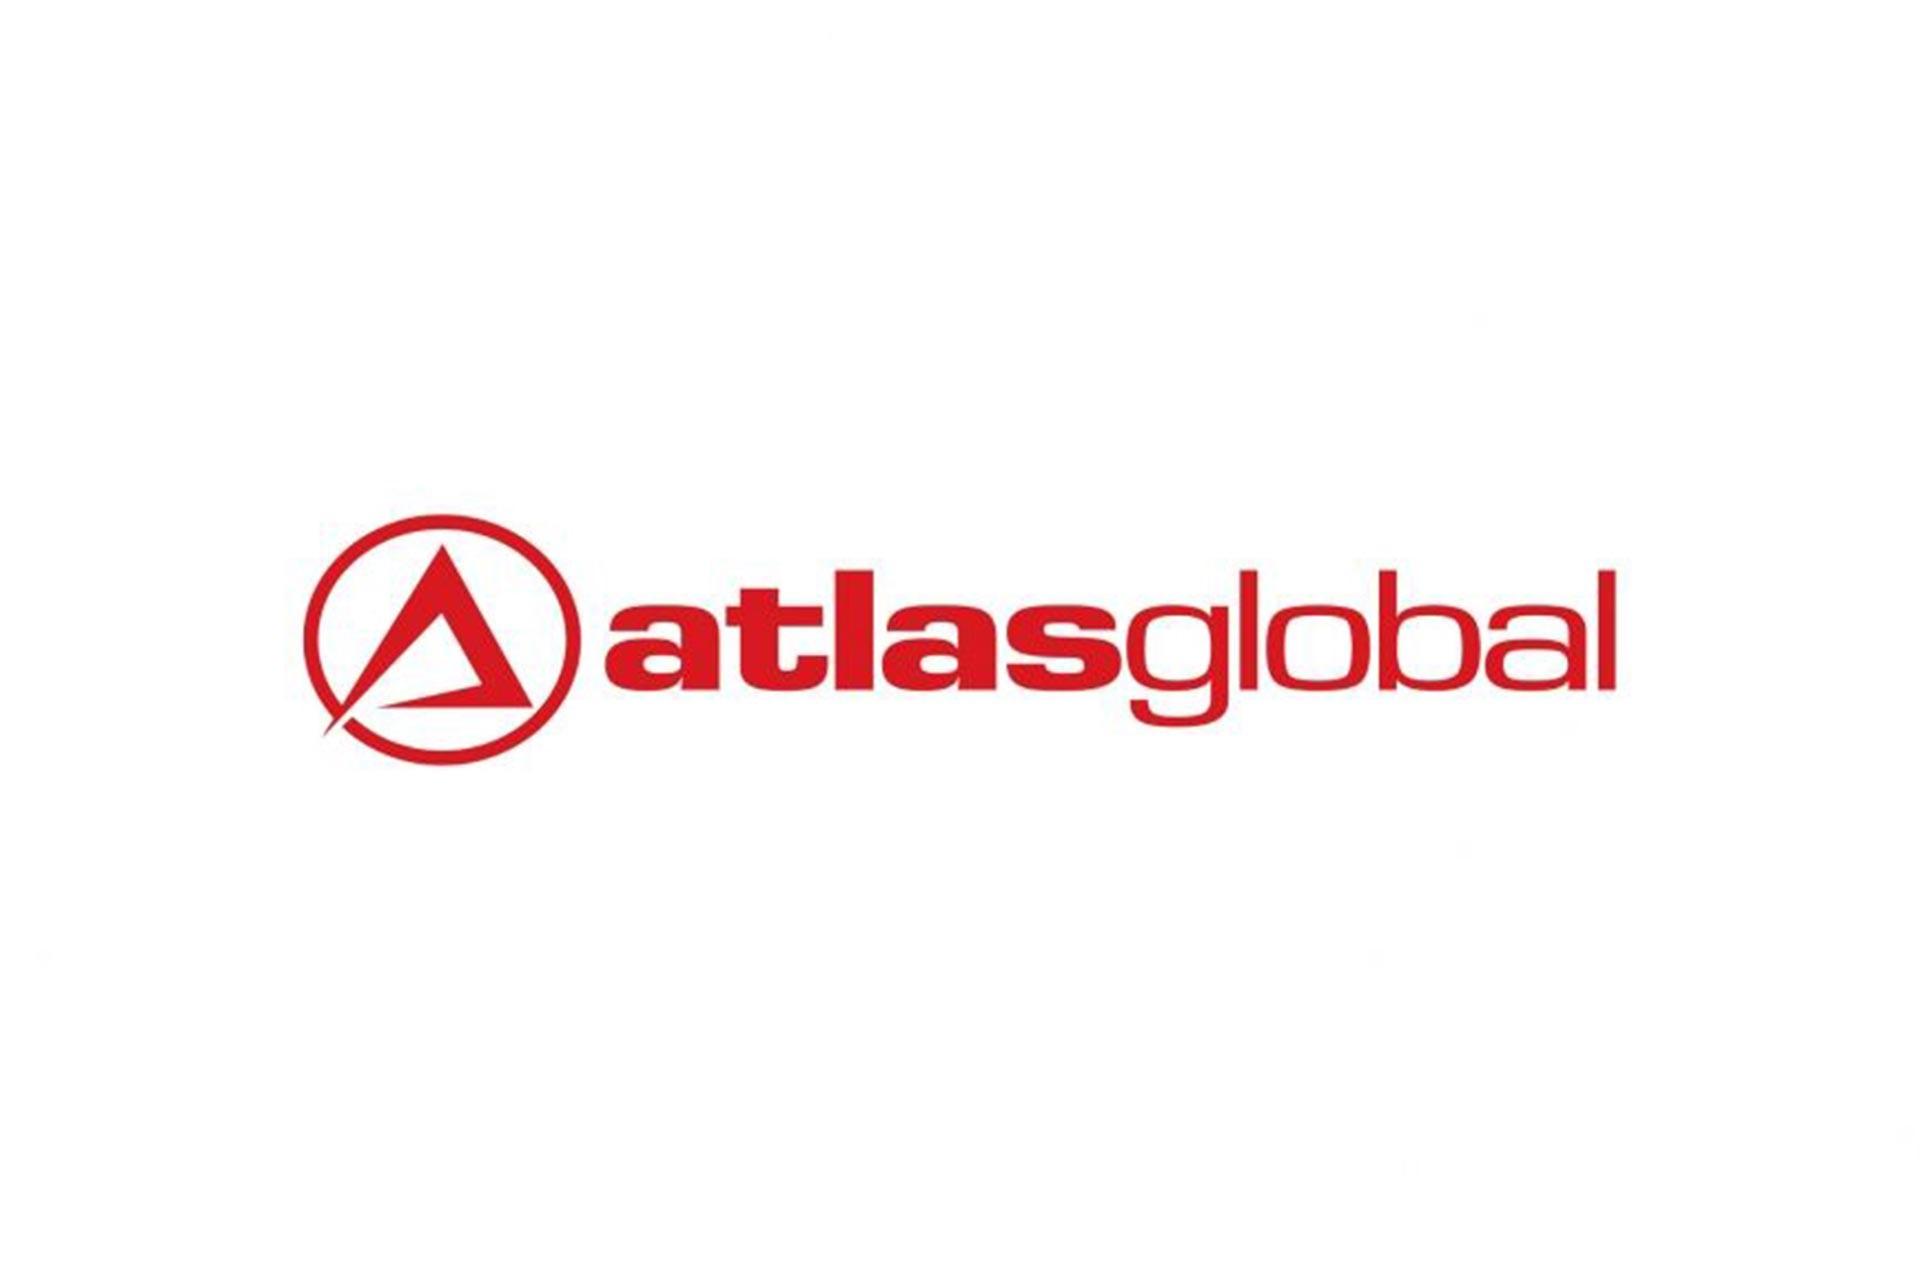 Atlasglobal logosu